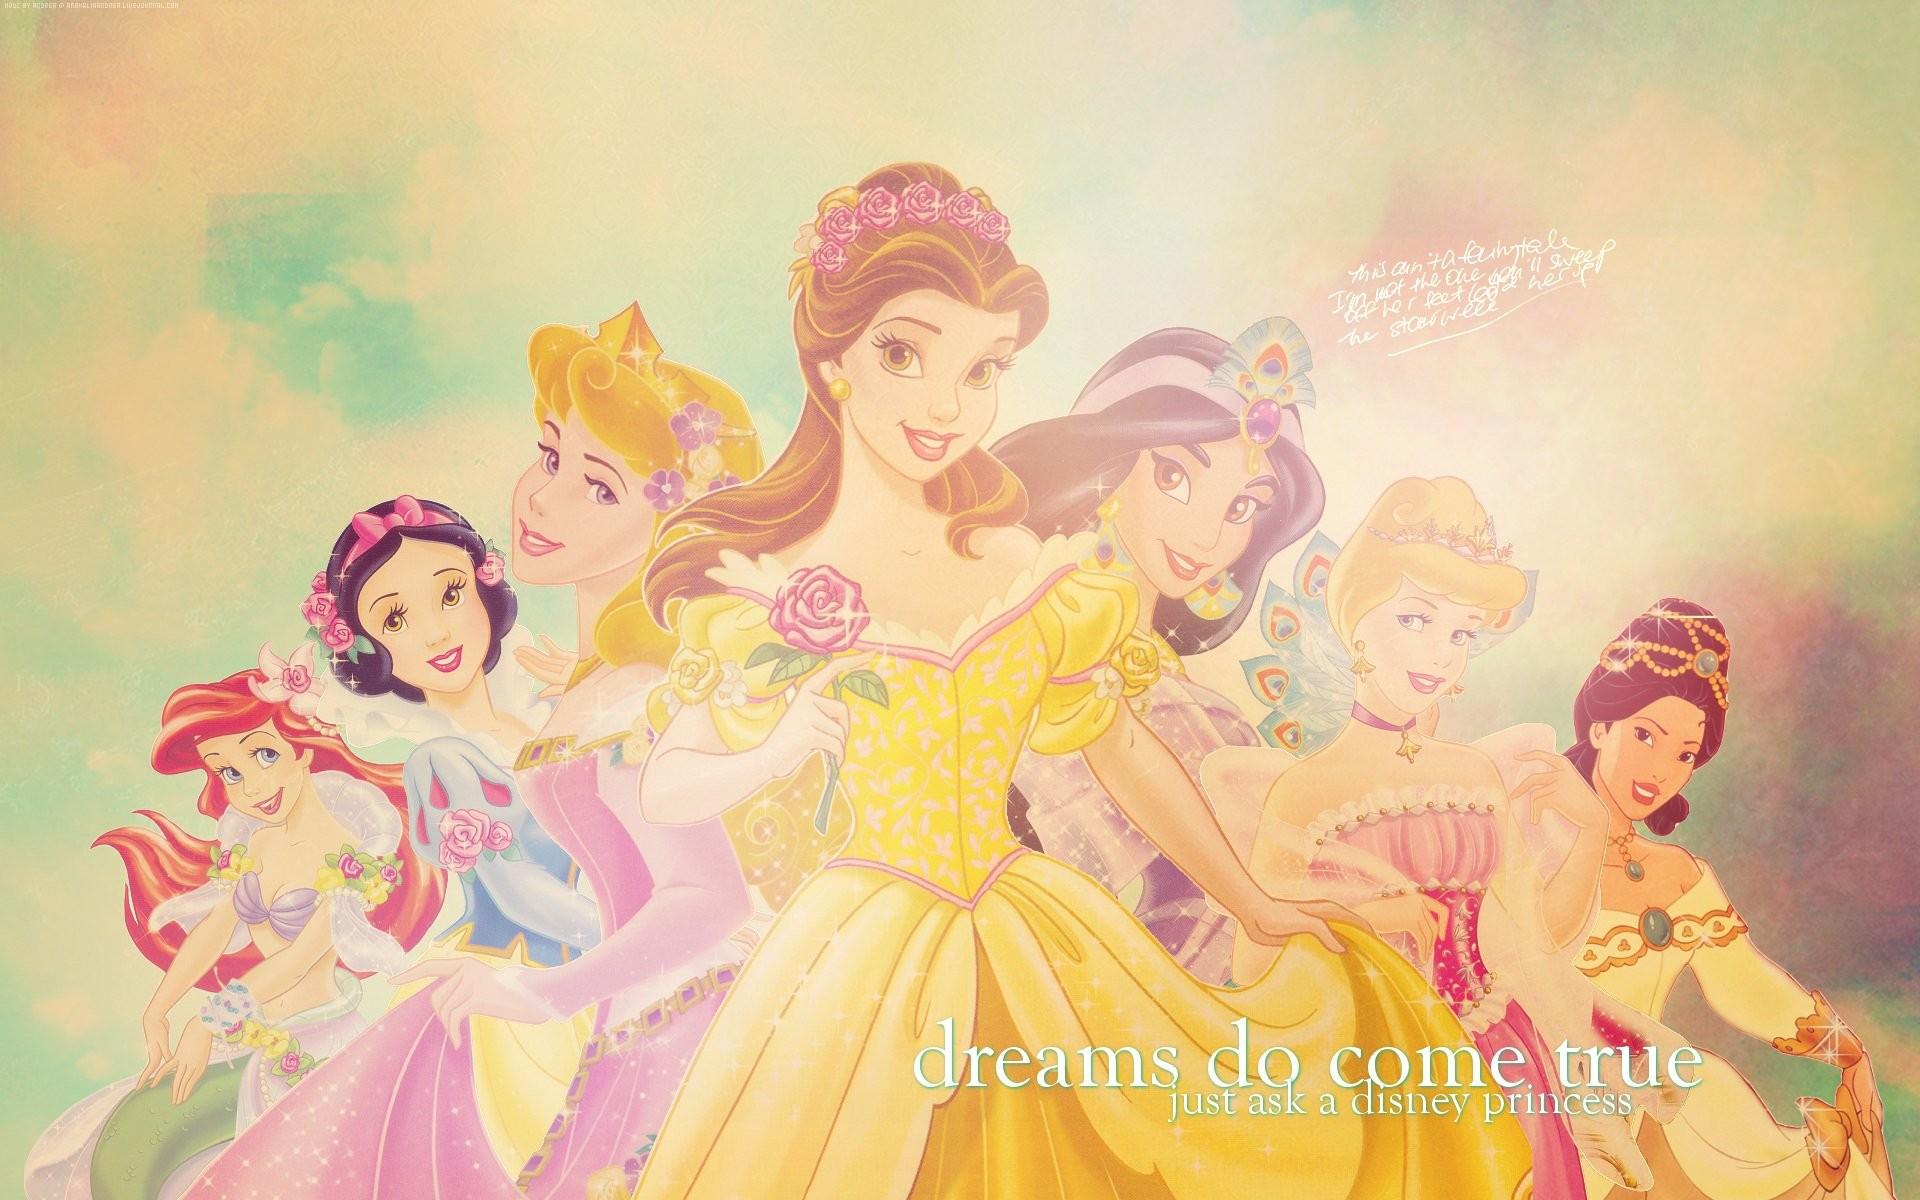 1978x1200 Sleeping Beauty Walt Disney Christmas Tree Fanart Movie Animated Film Fairytale Princess Aurora Phillip Forest